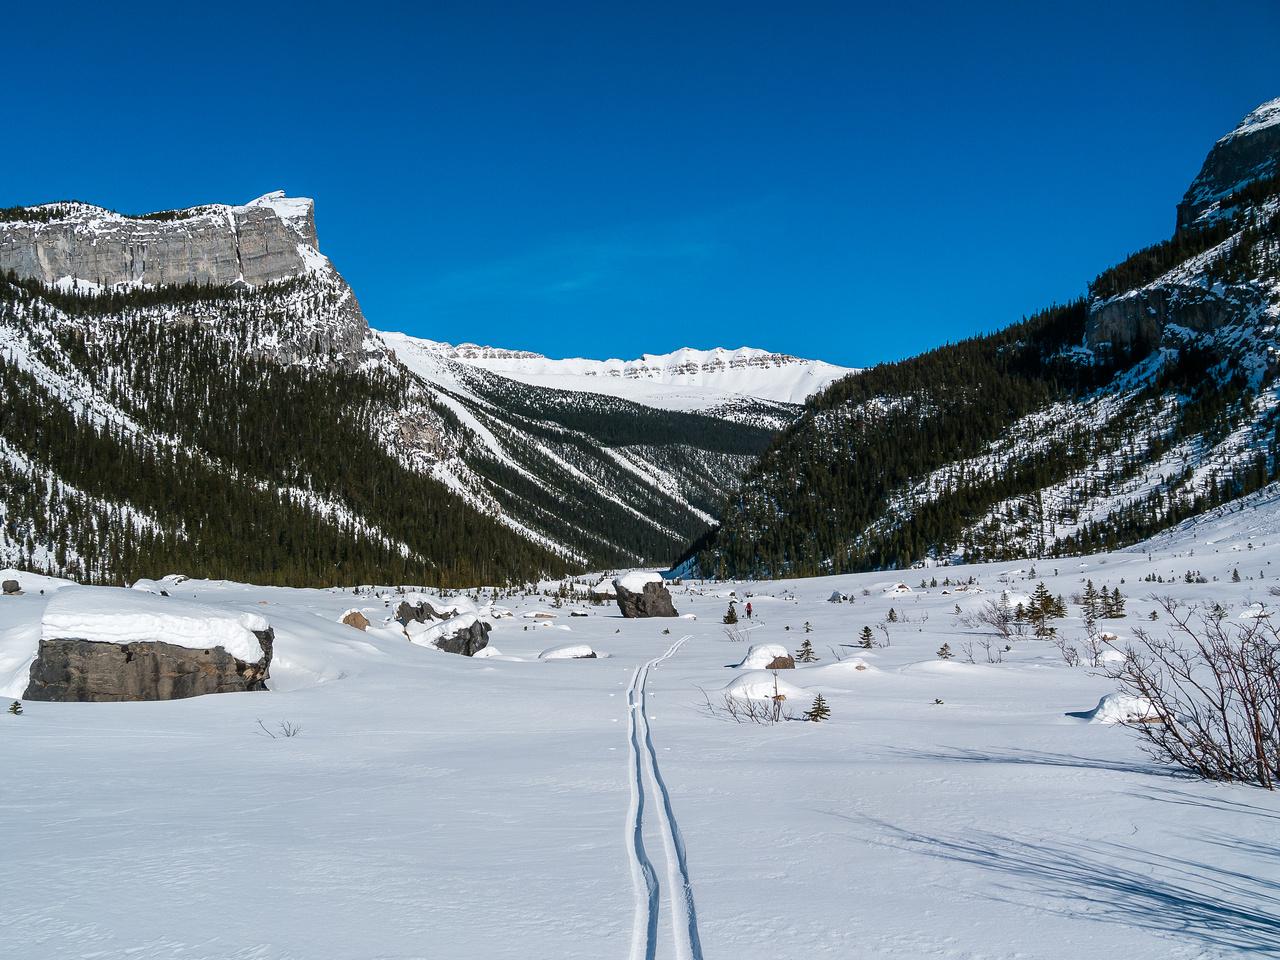 Skiing down Balfour Creek to Hector Lake.